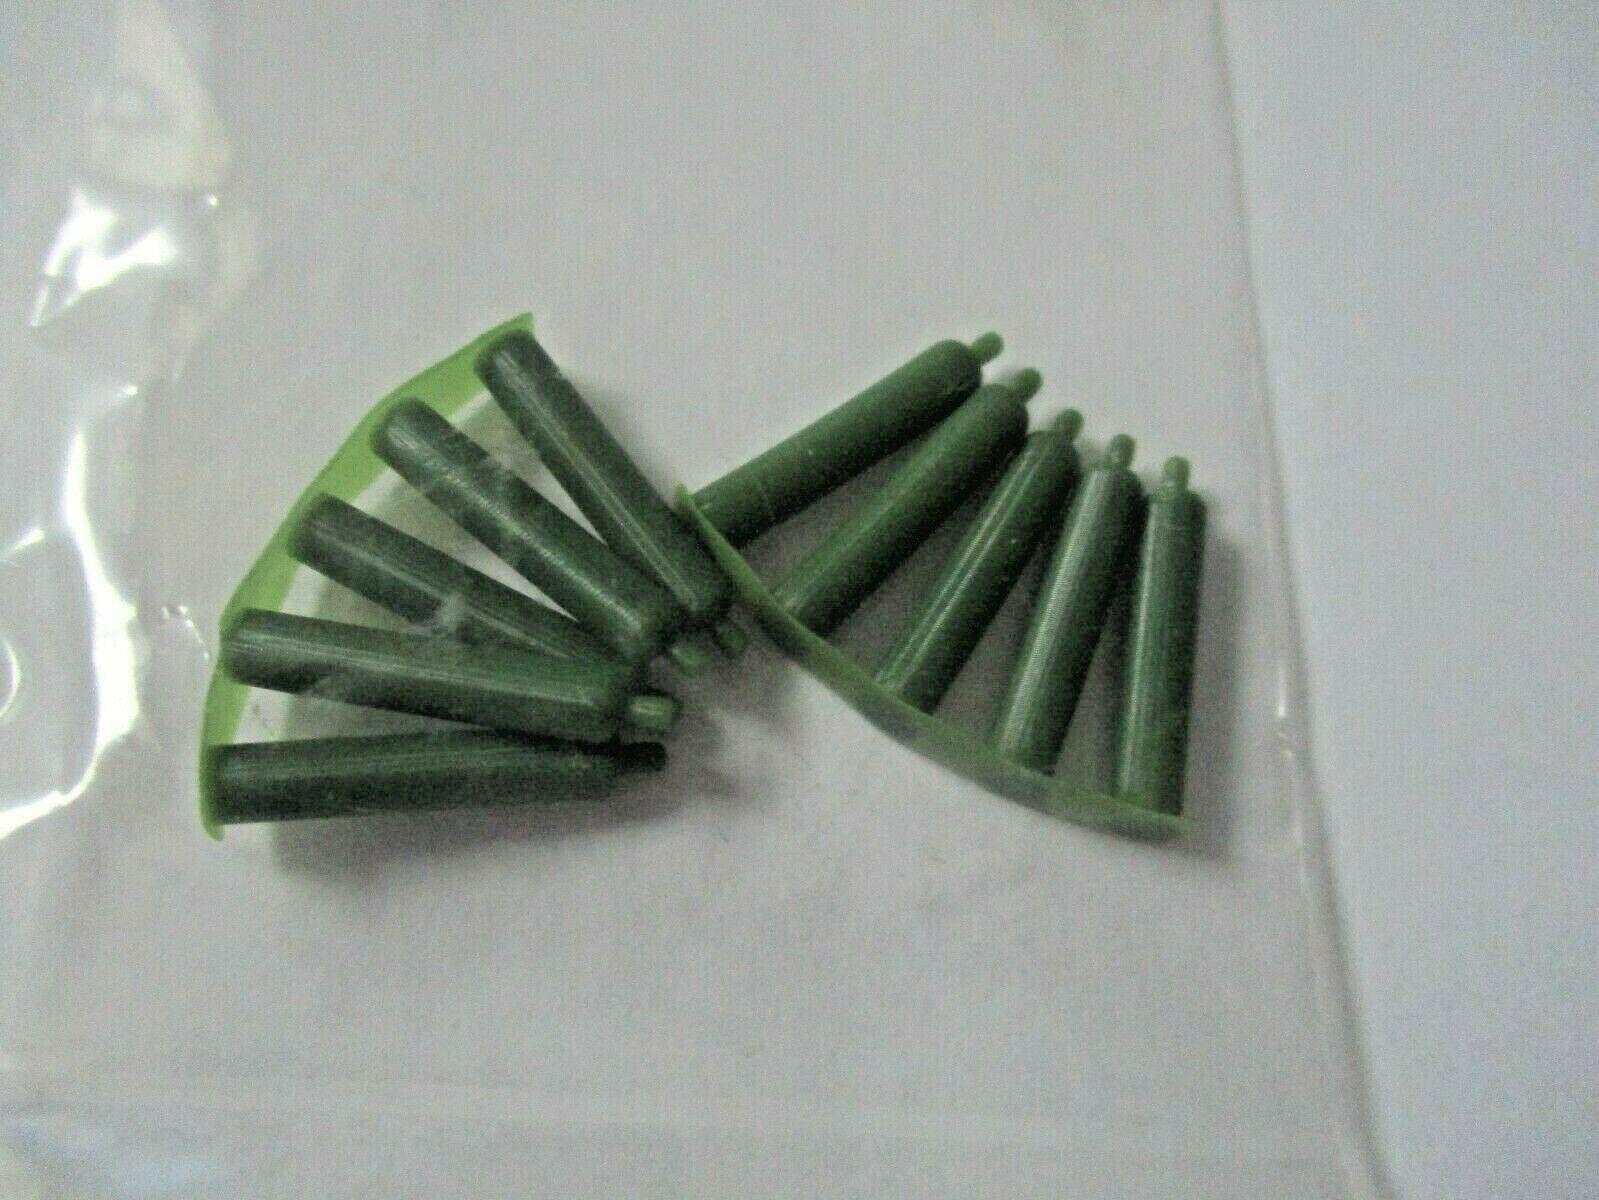 Atlas # 4002011 Oxygen Tanks 10 Pieces 3D Printed Accessories HO Scale